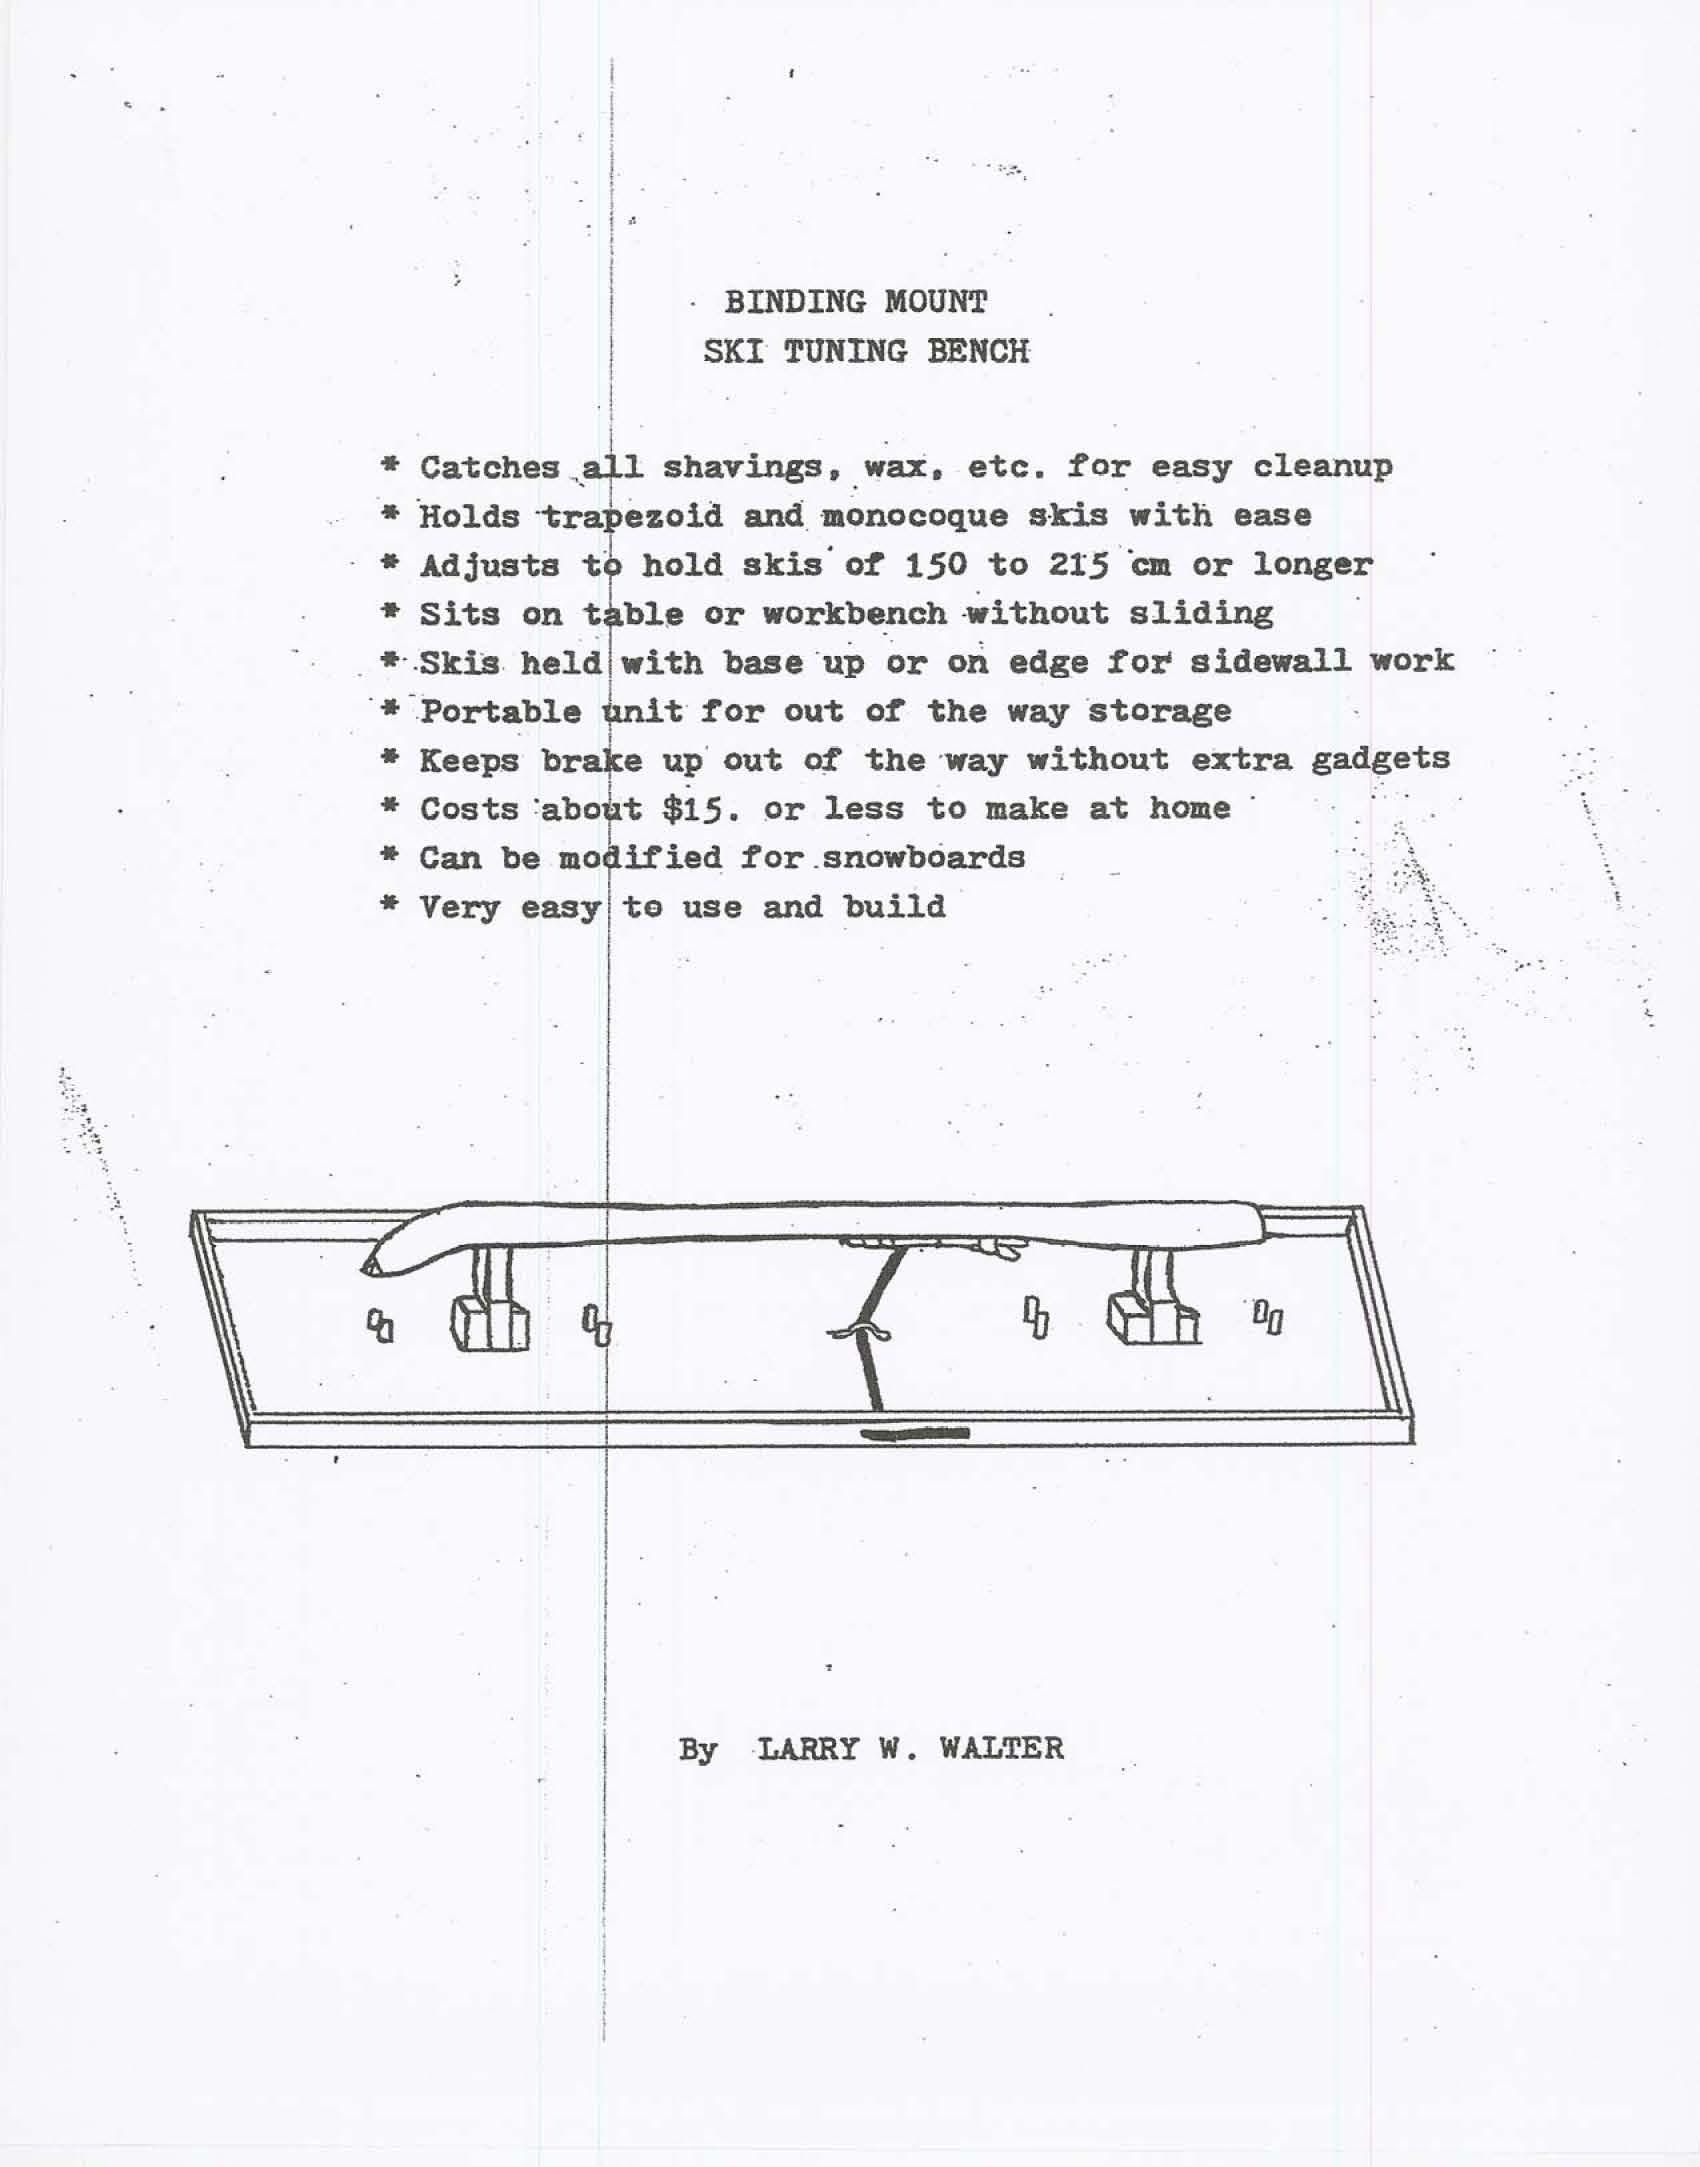 toolbenchplans-img-0.jpg